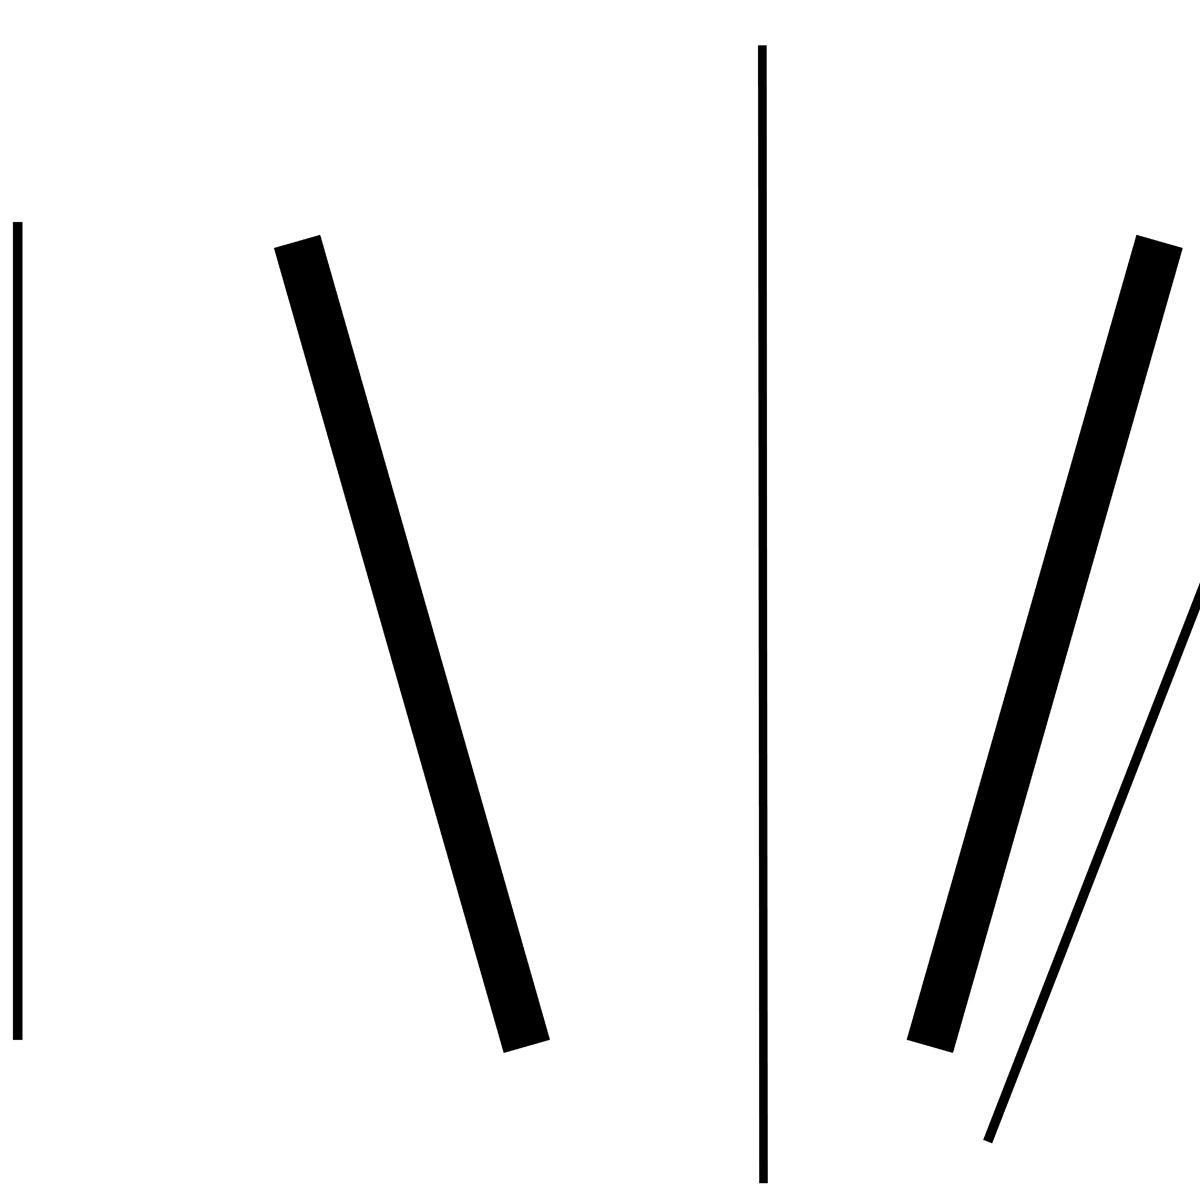 KV_Tension_Spannung